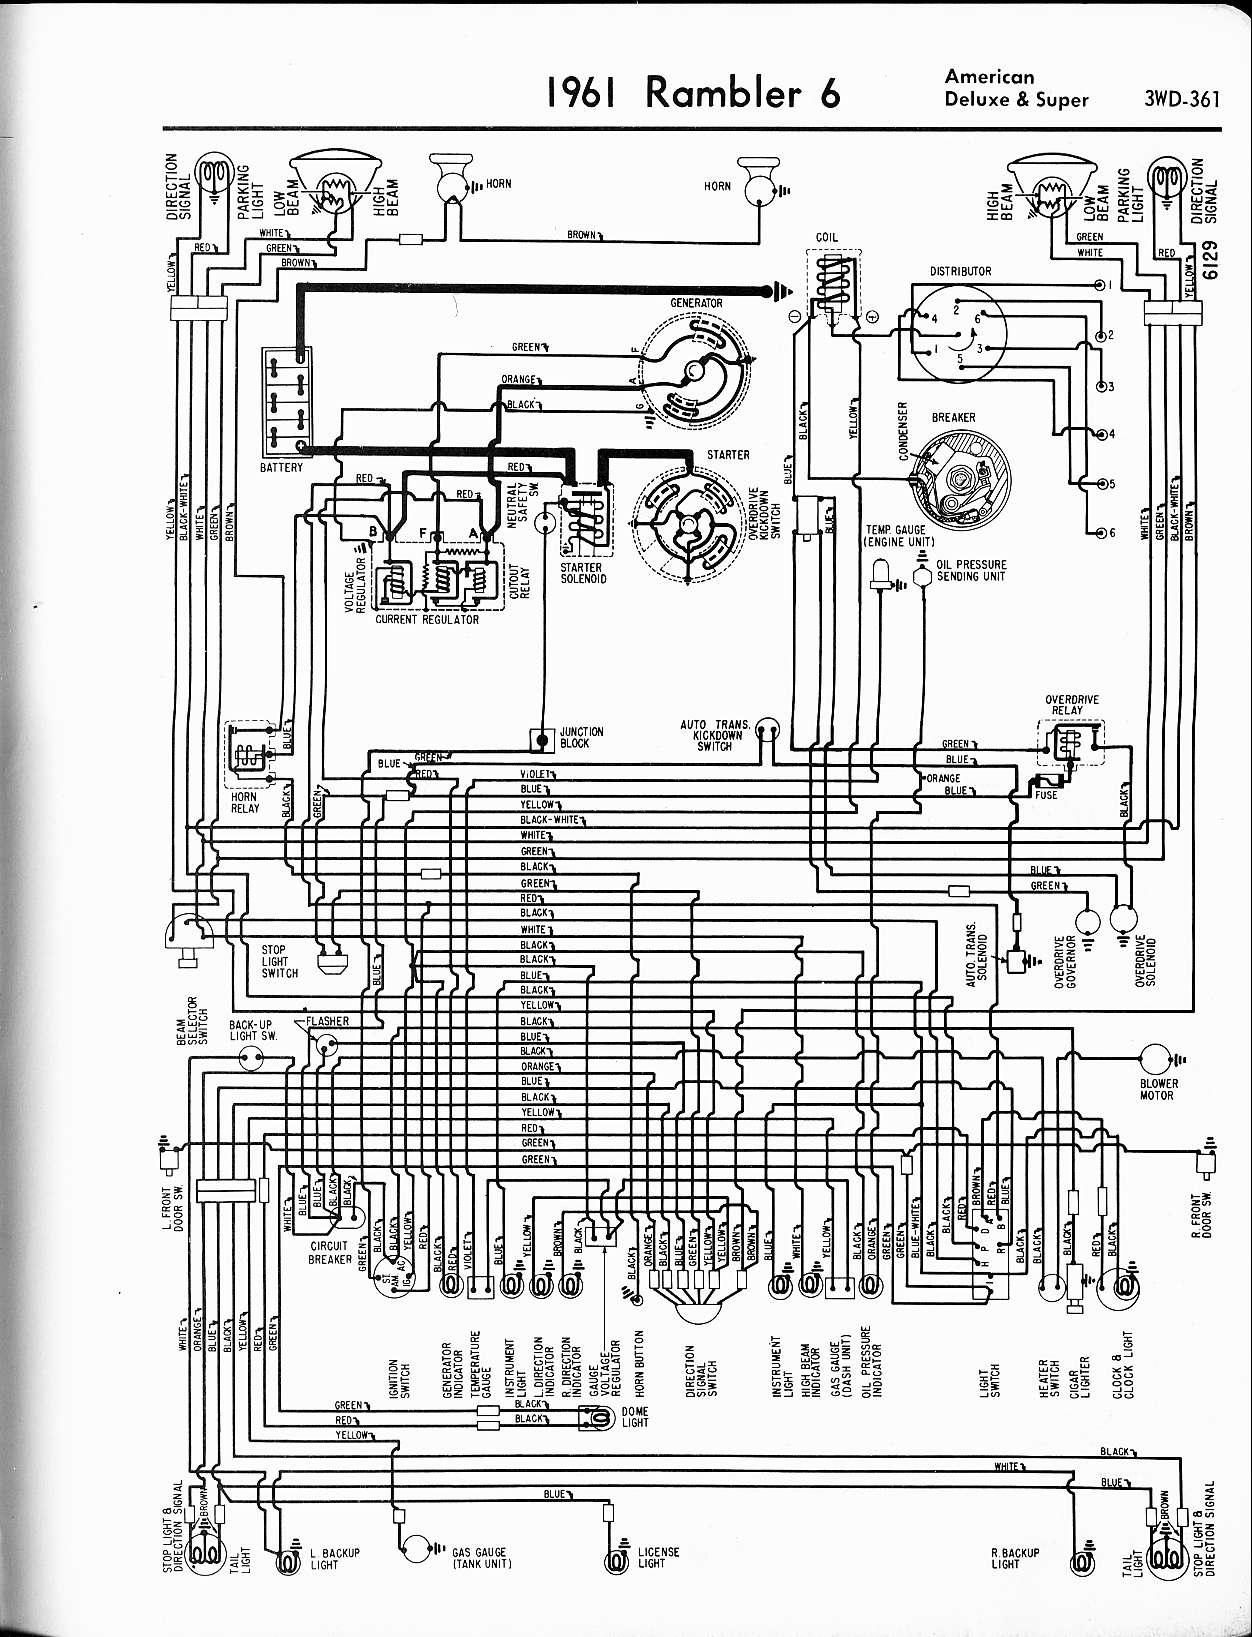 international 8100 wiring diagram diagrams wiring diagram images rh magicalillusions org Car Stereo Wiring Diagram F100 Wiring Diagram